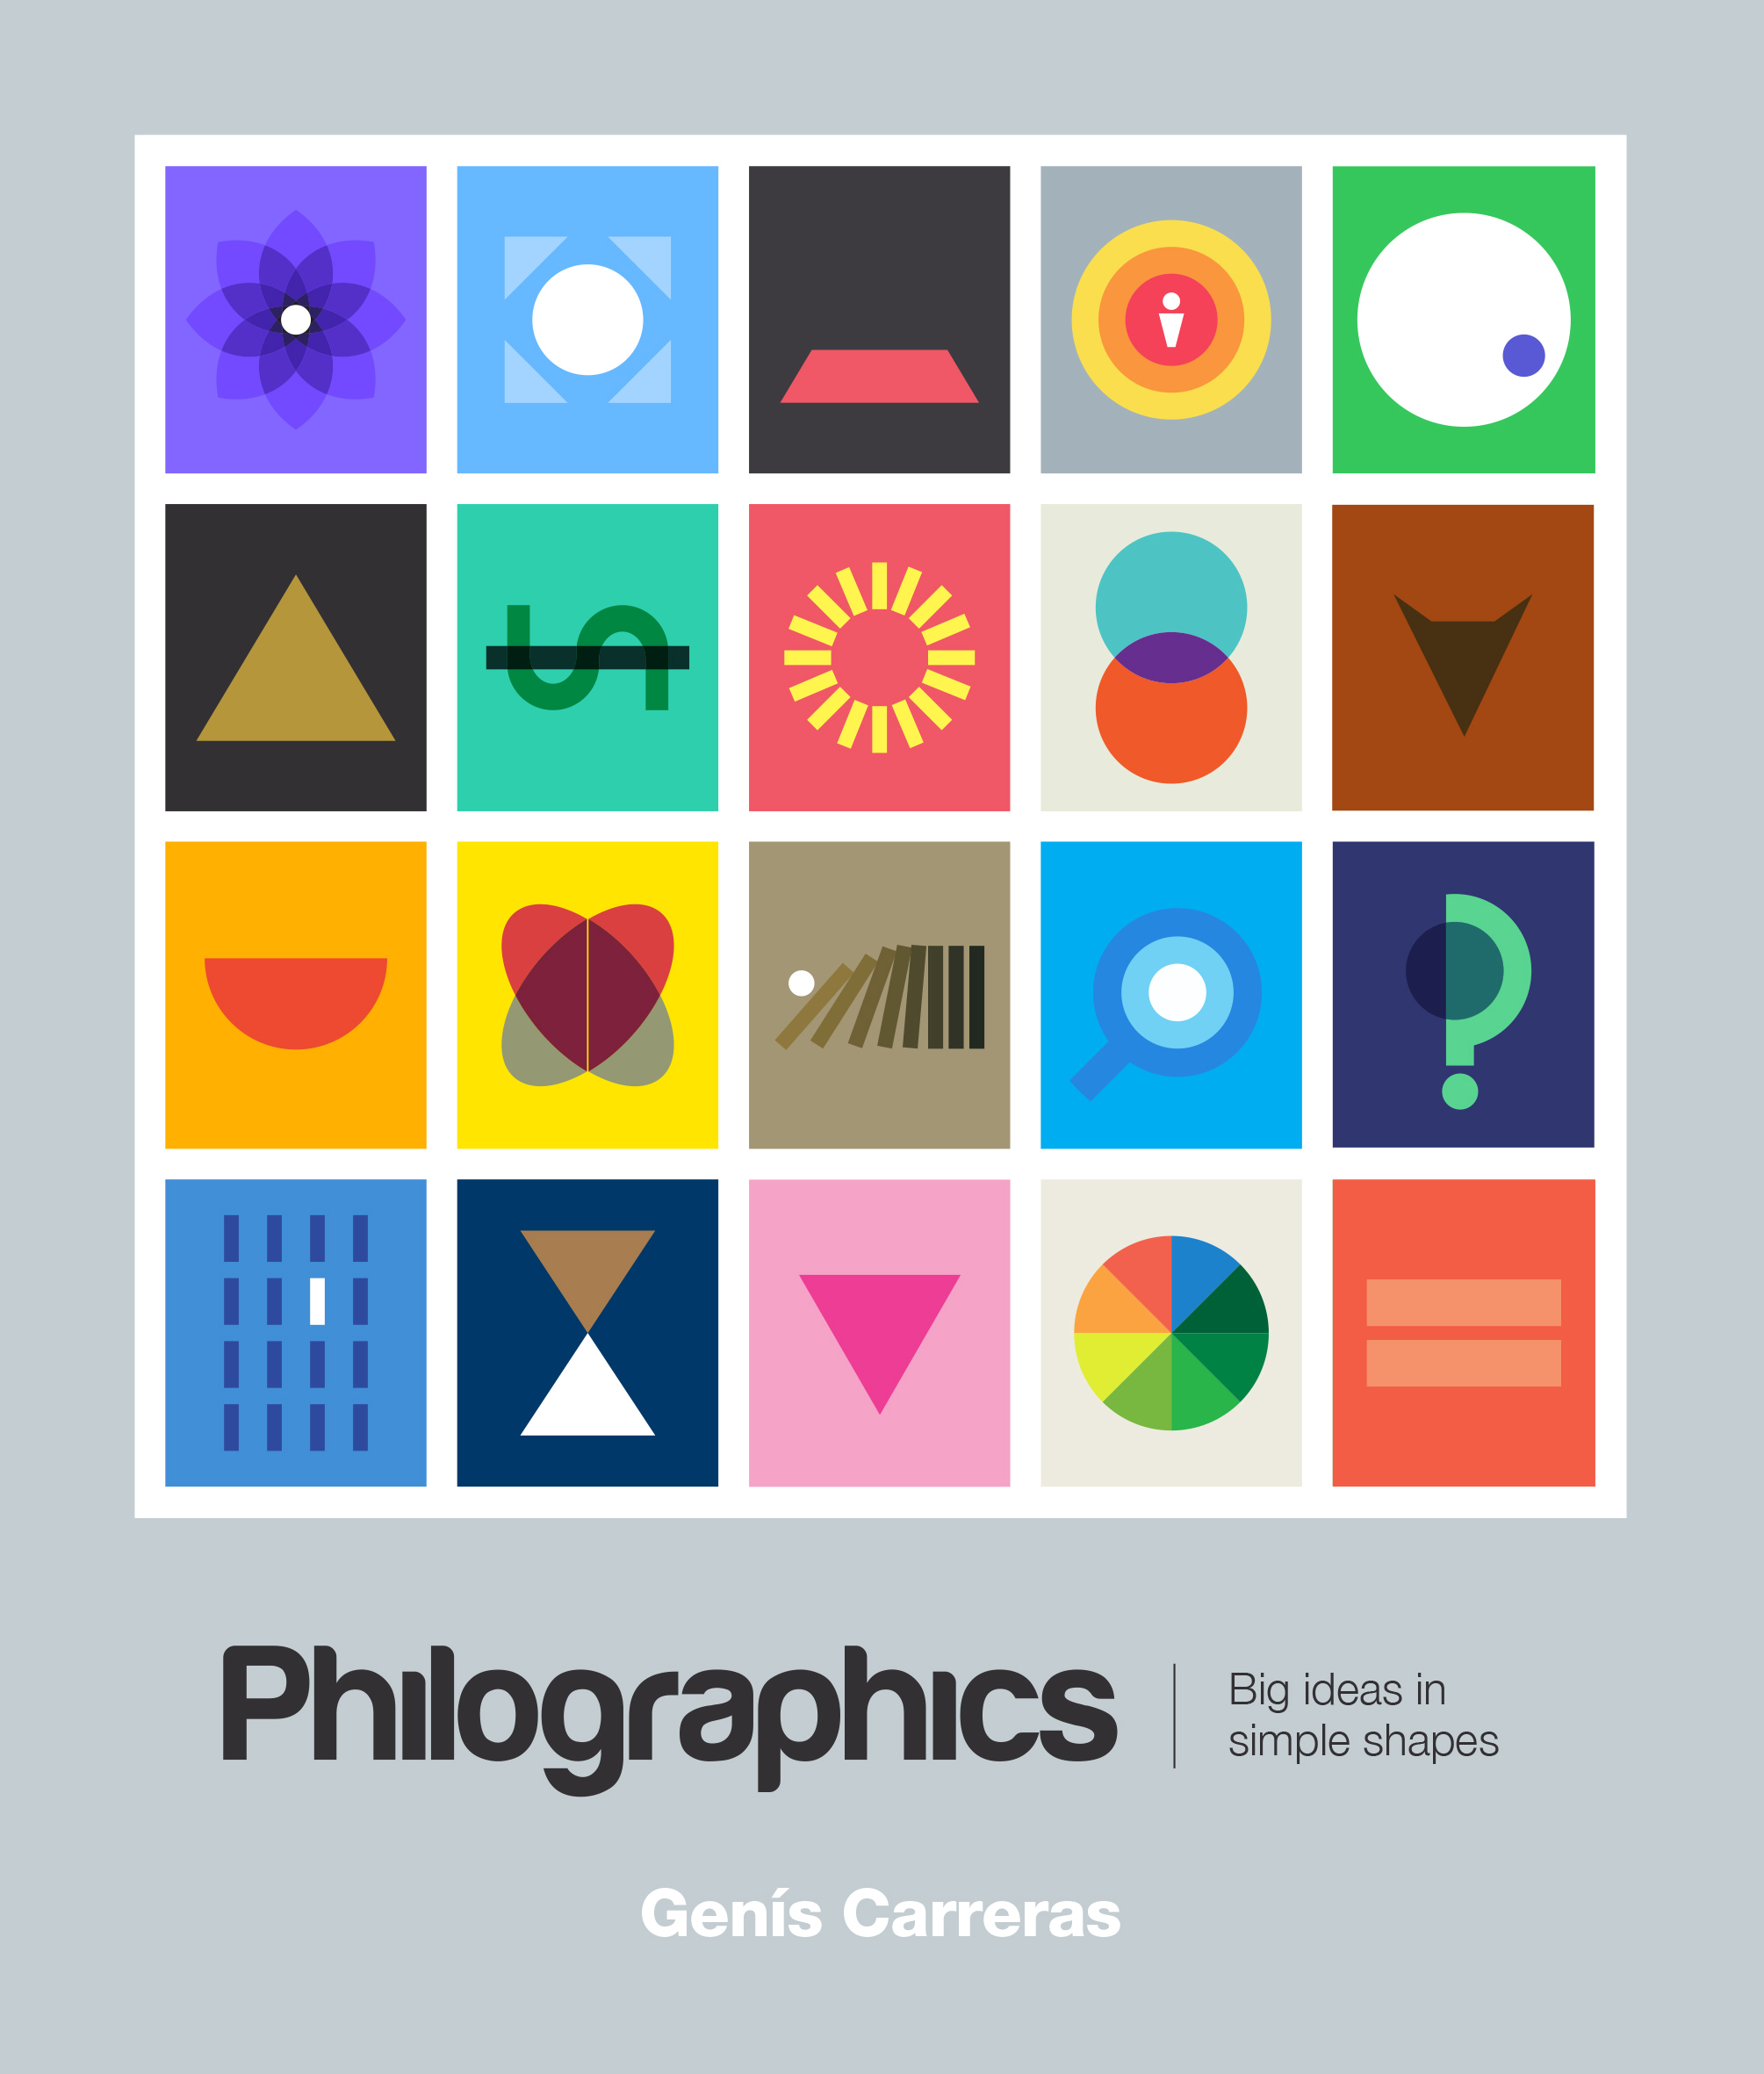 Philographics di Genis Carreras